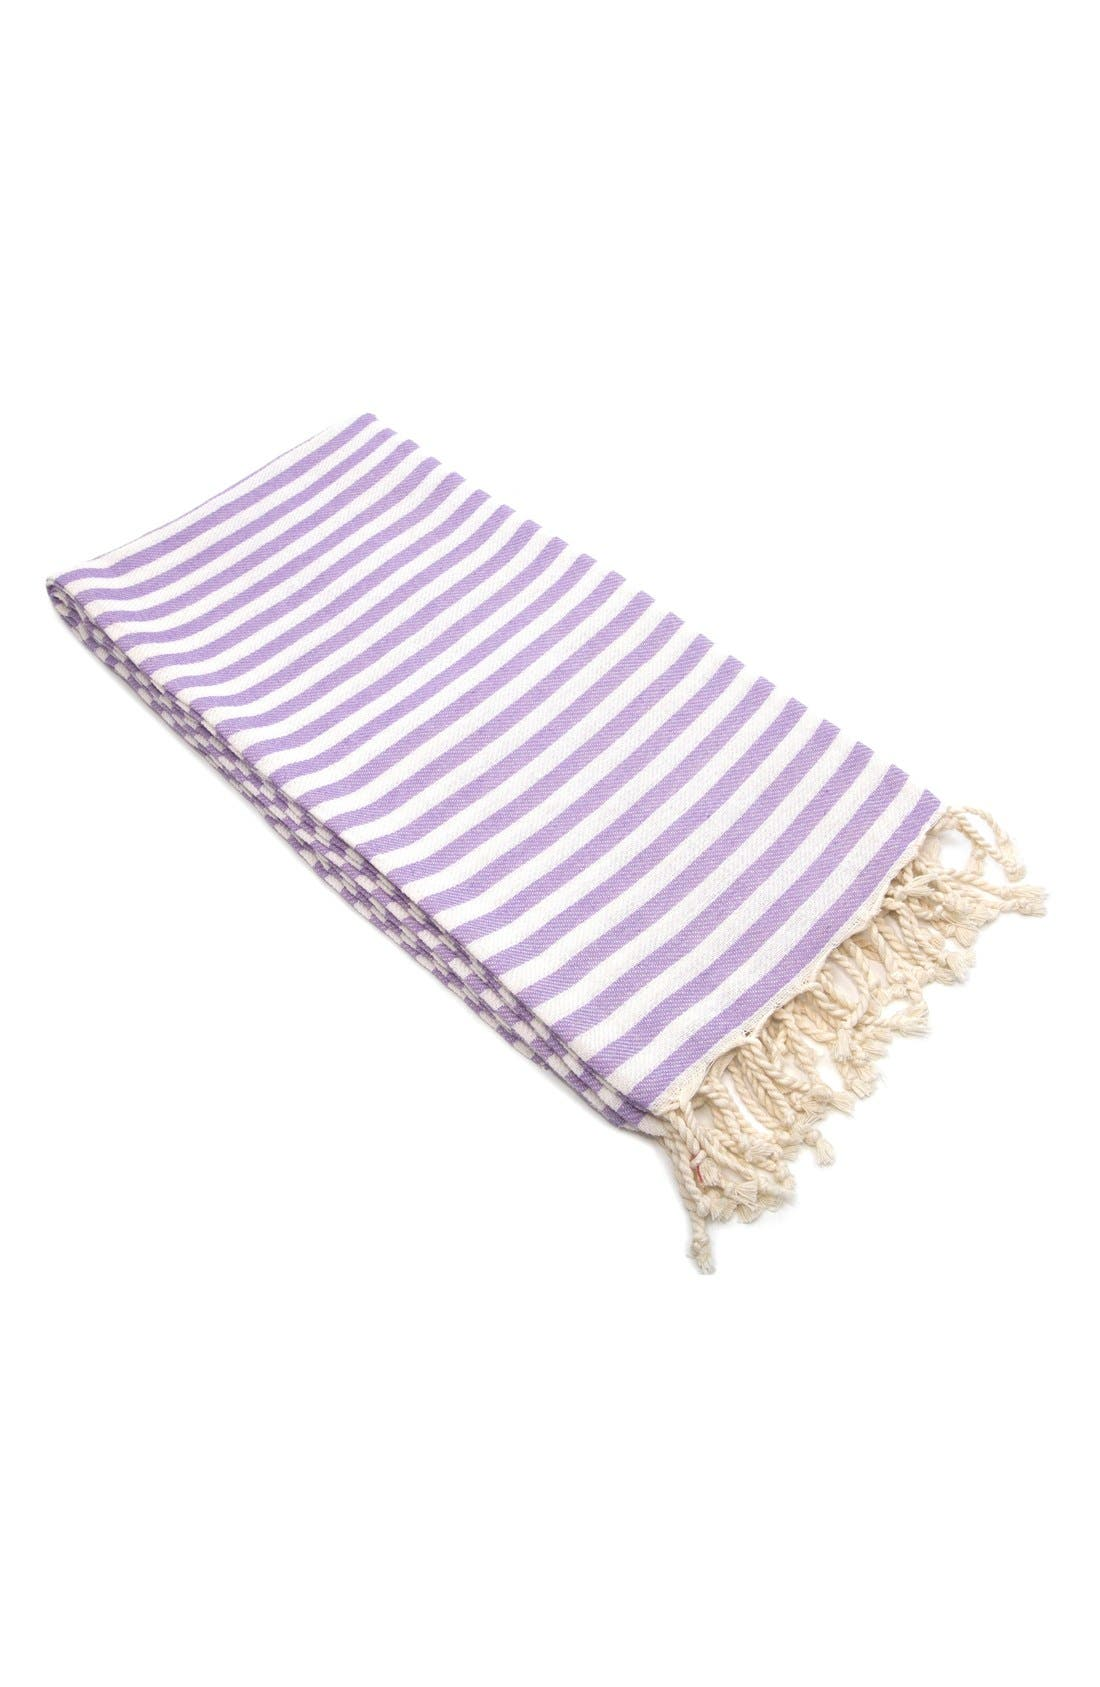 'Fun in the Sun' Turkish Pestemal Towel,                         Main,                         color, Lilac